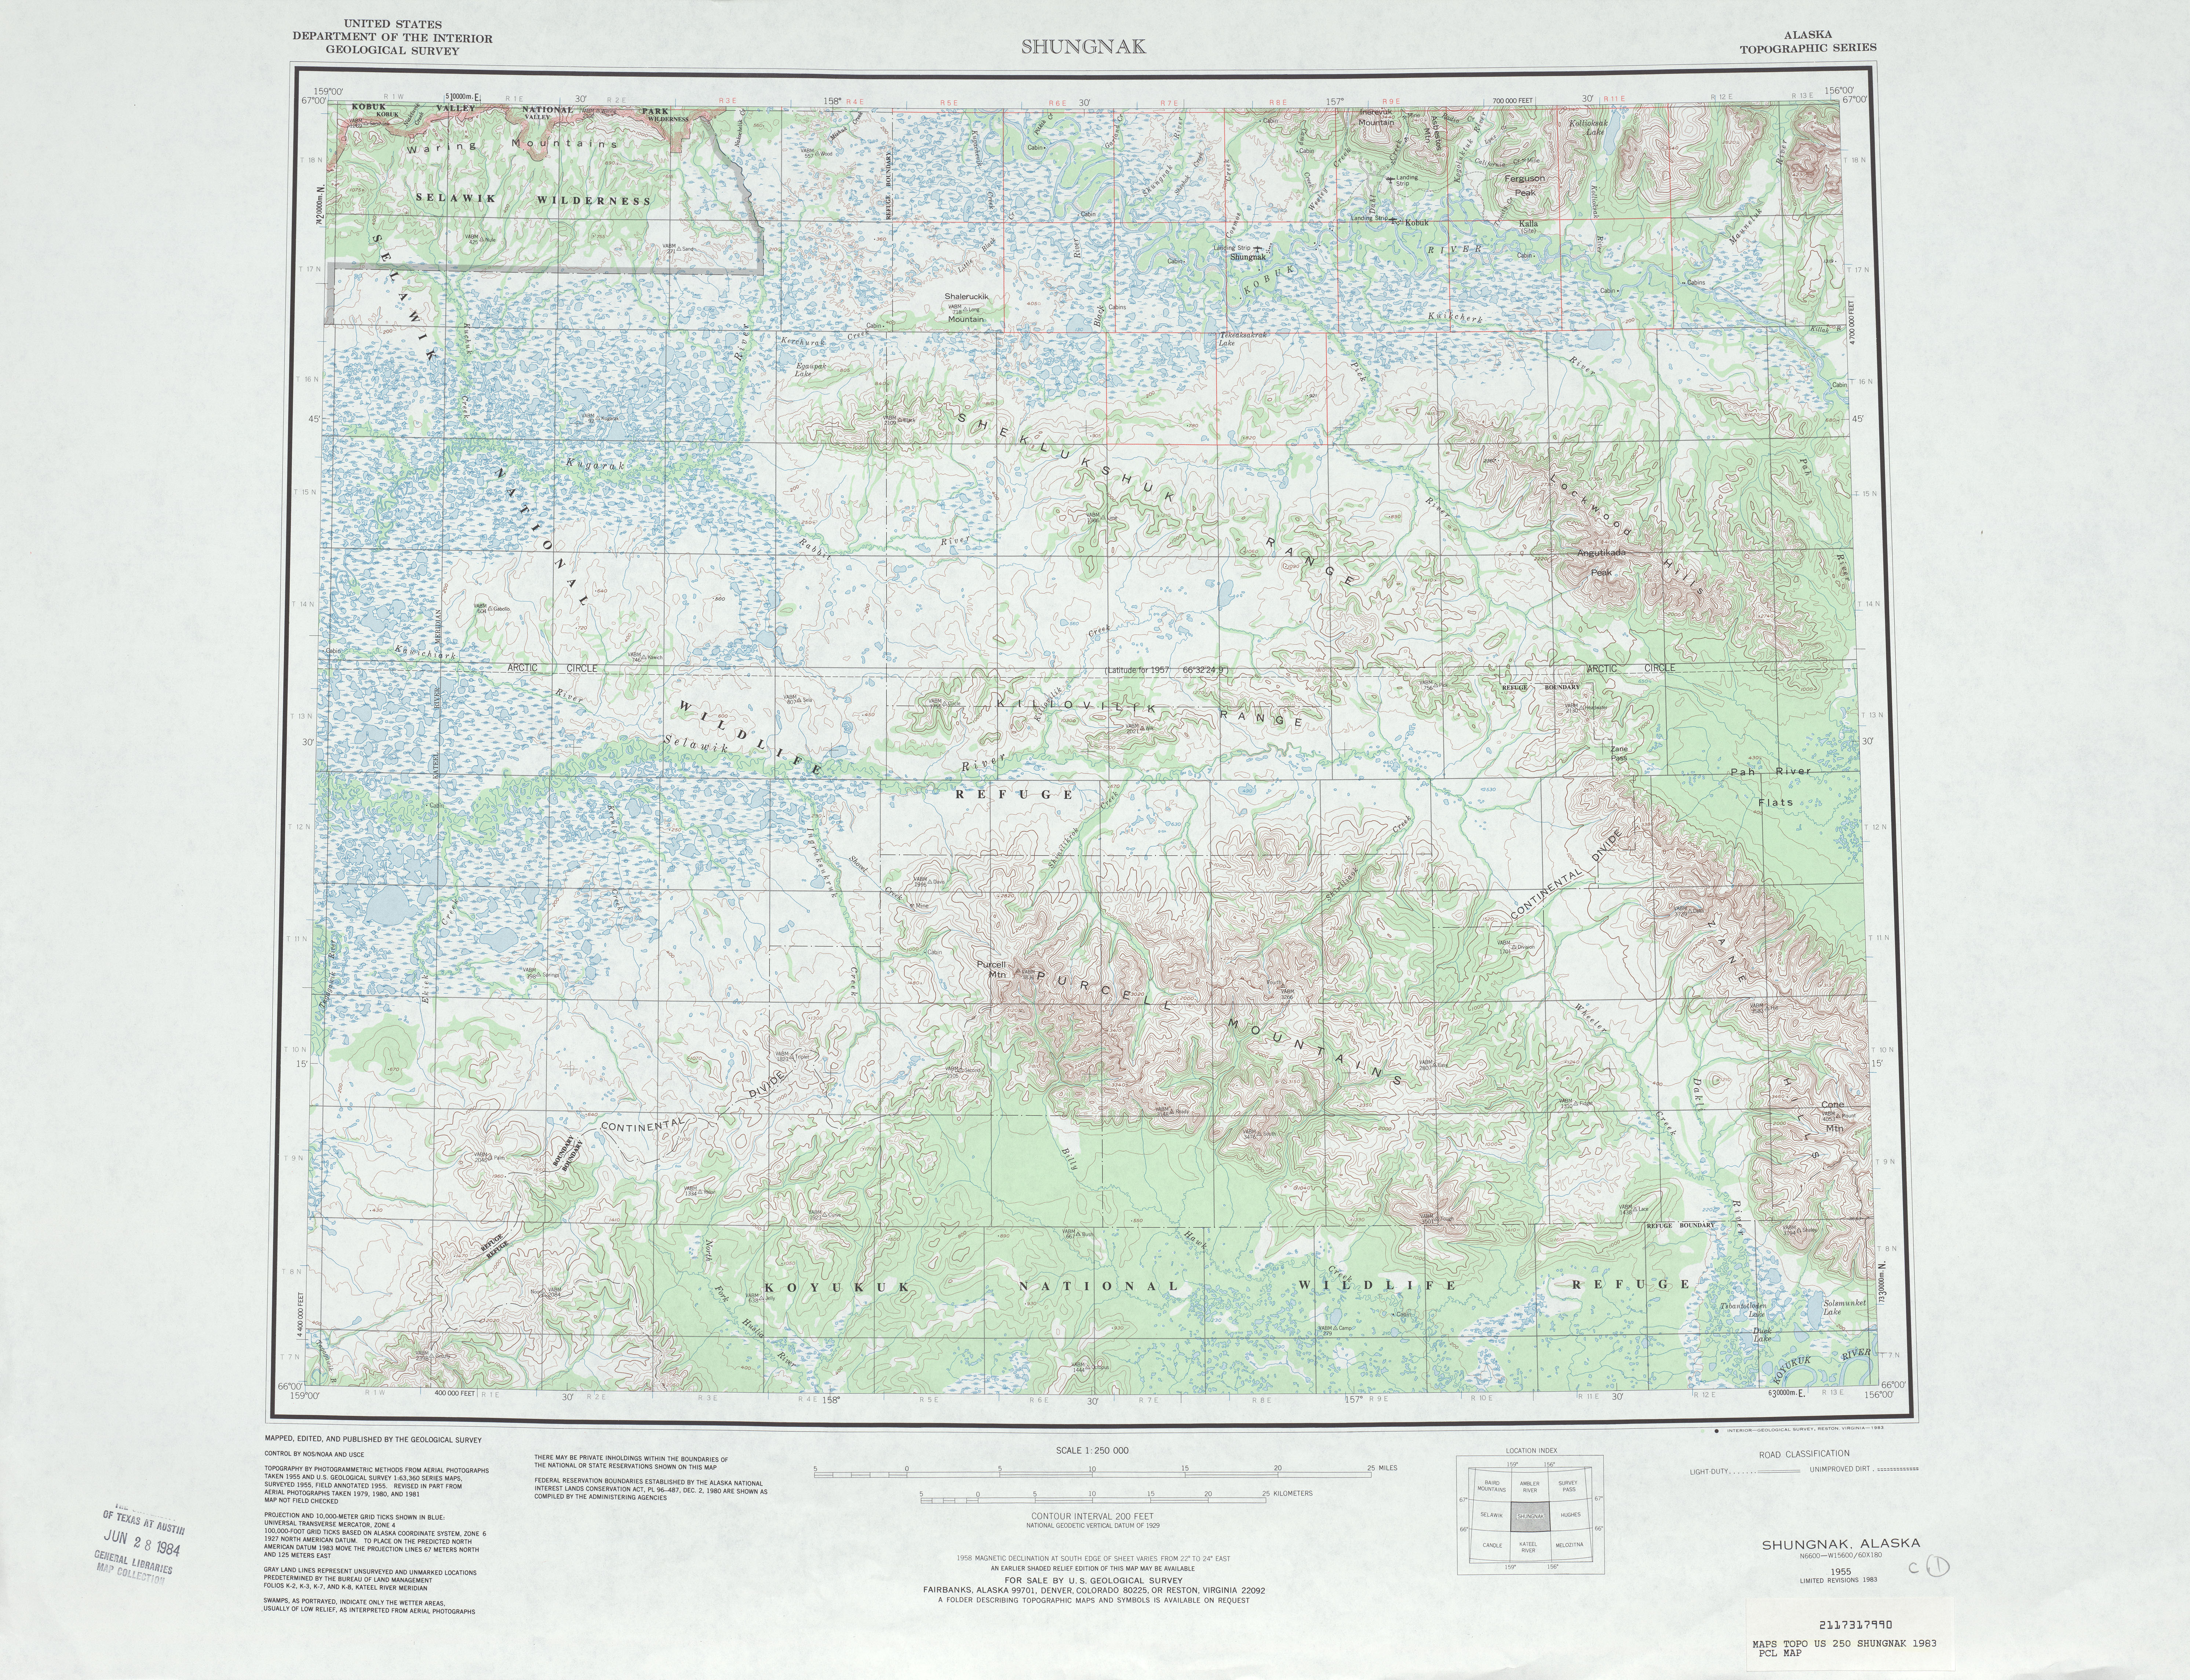 Shungnak Topographic Map Sheet, United States 1983